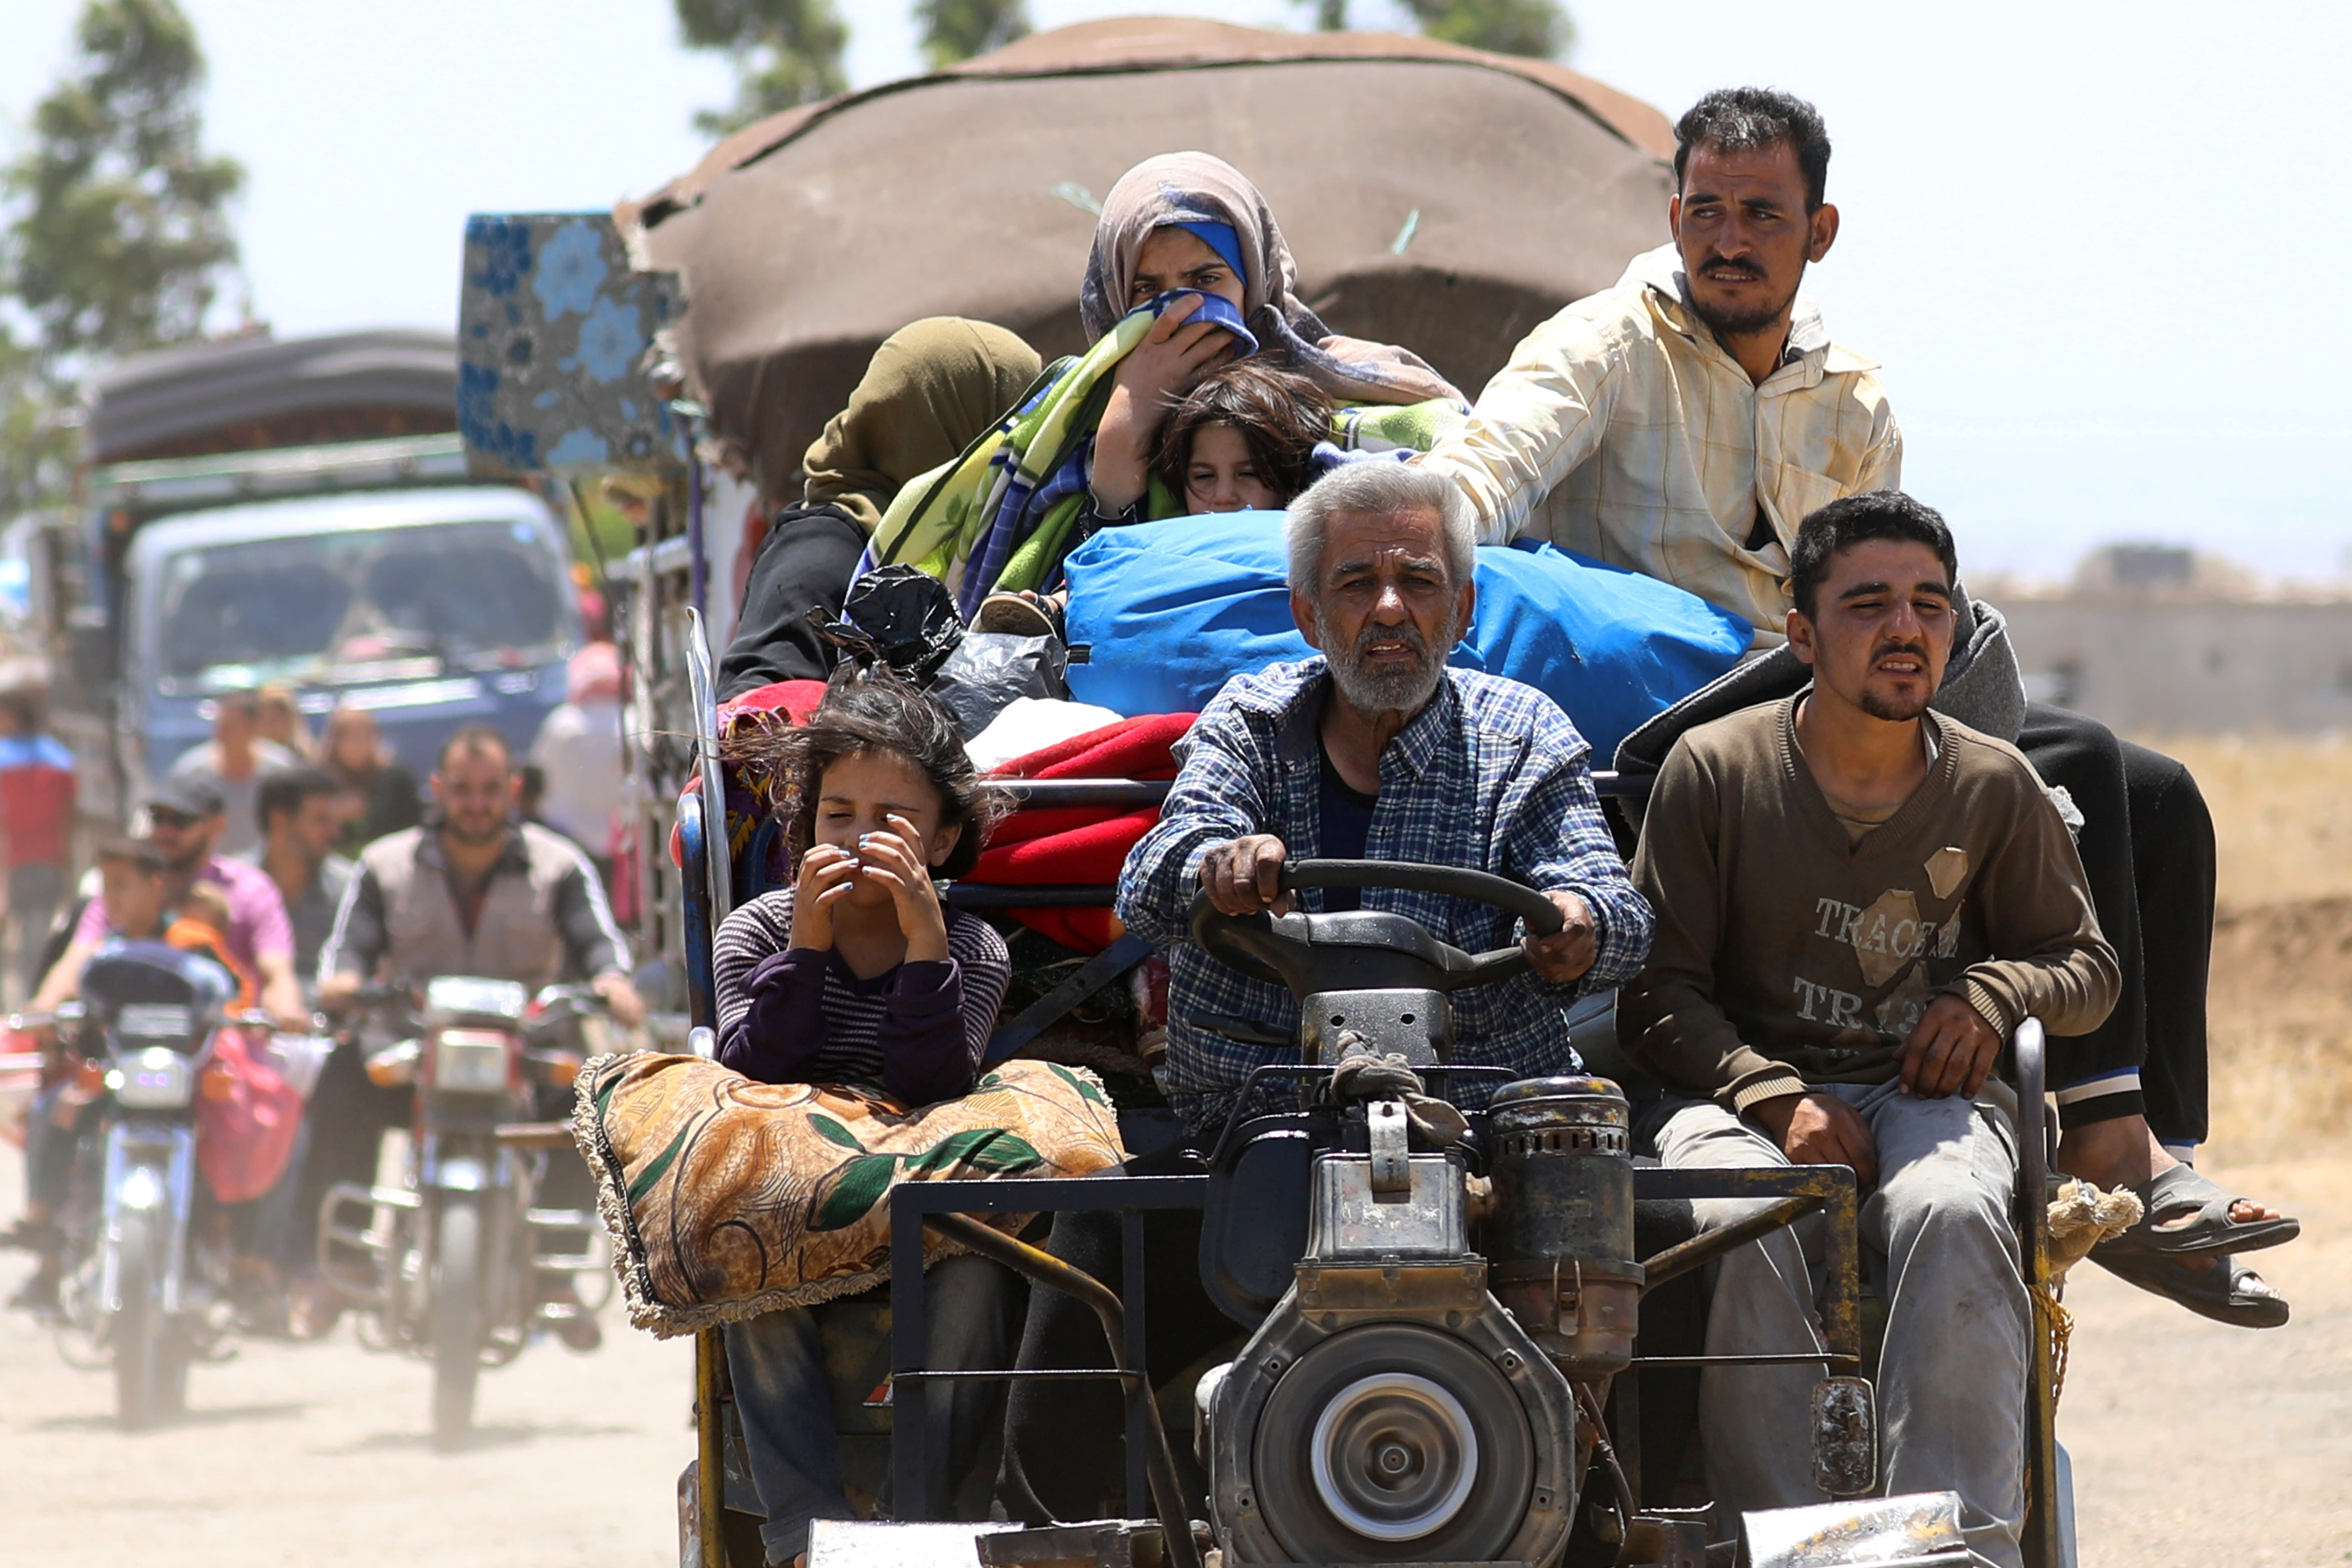 Internally displaced people from Deraa province arrive near the Golan Heights in Quneitra, Syria June 29, 2018. (REUTERS/ALAA AL-FAQIR)